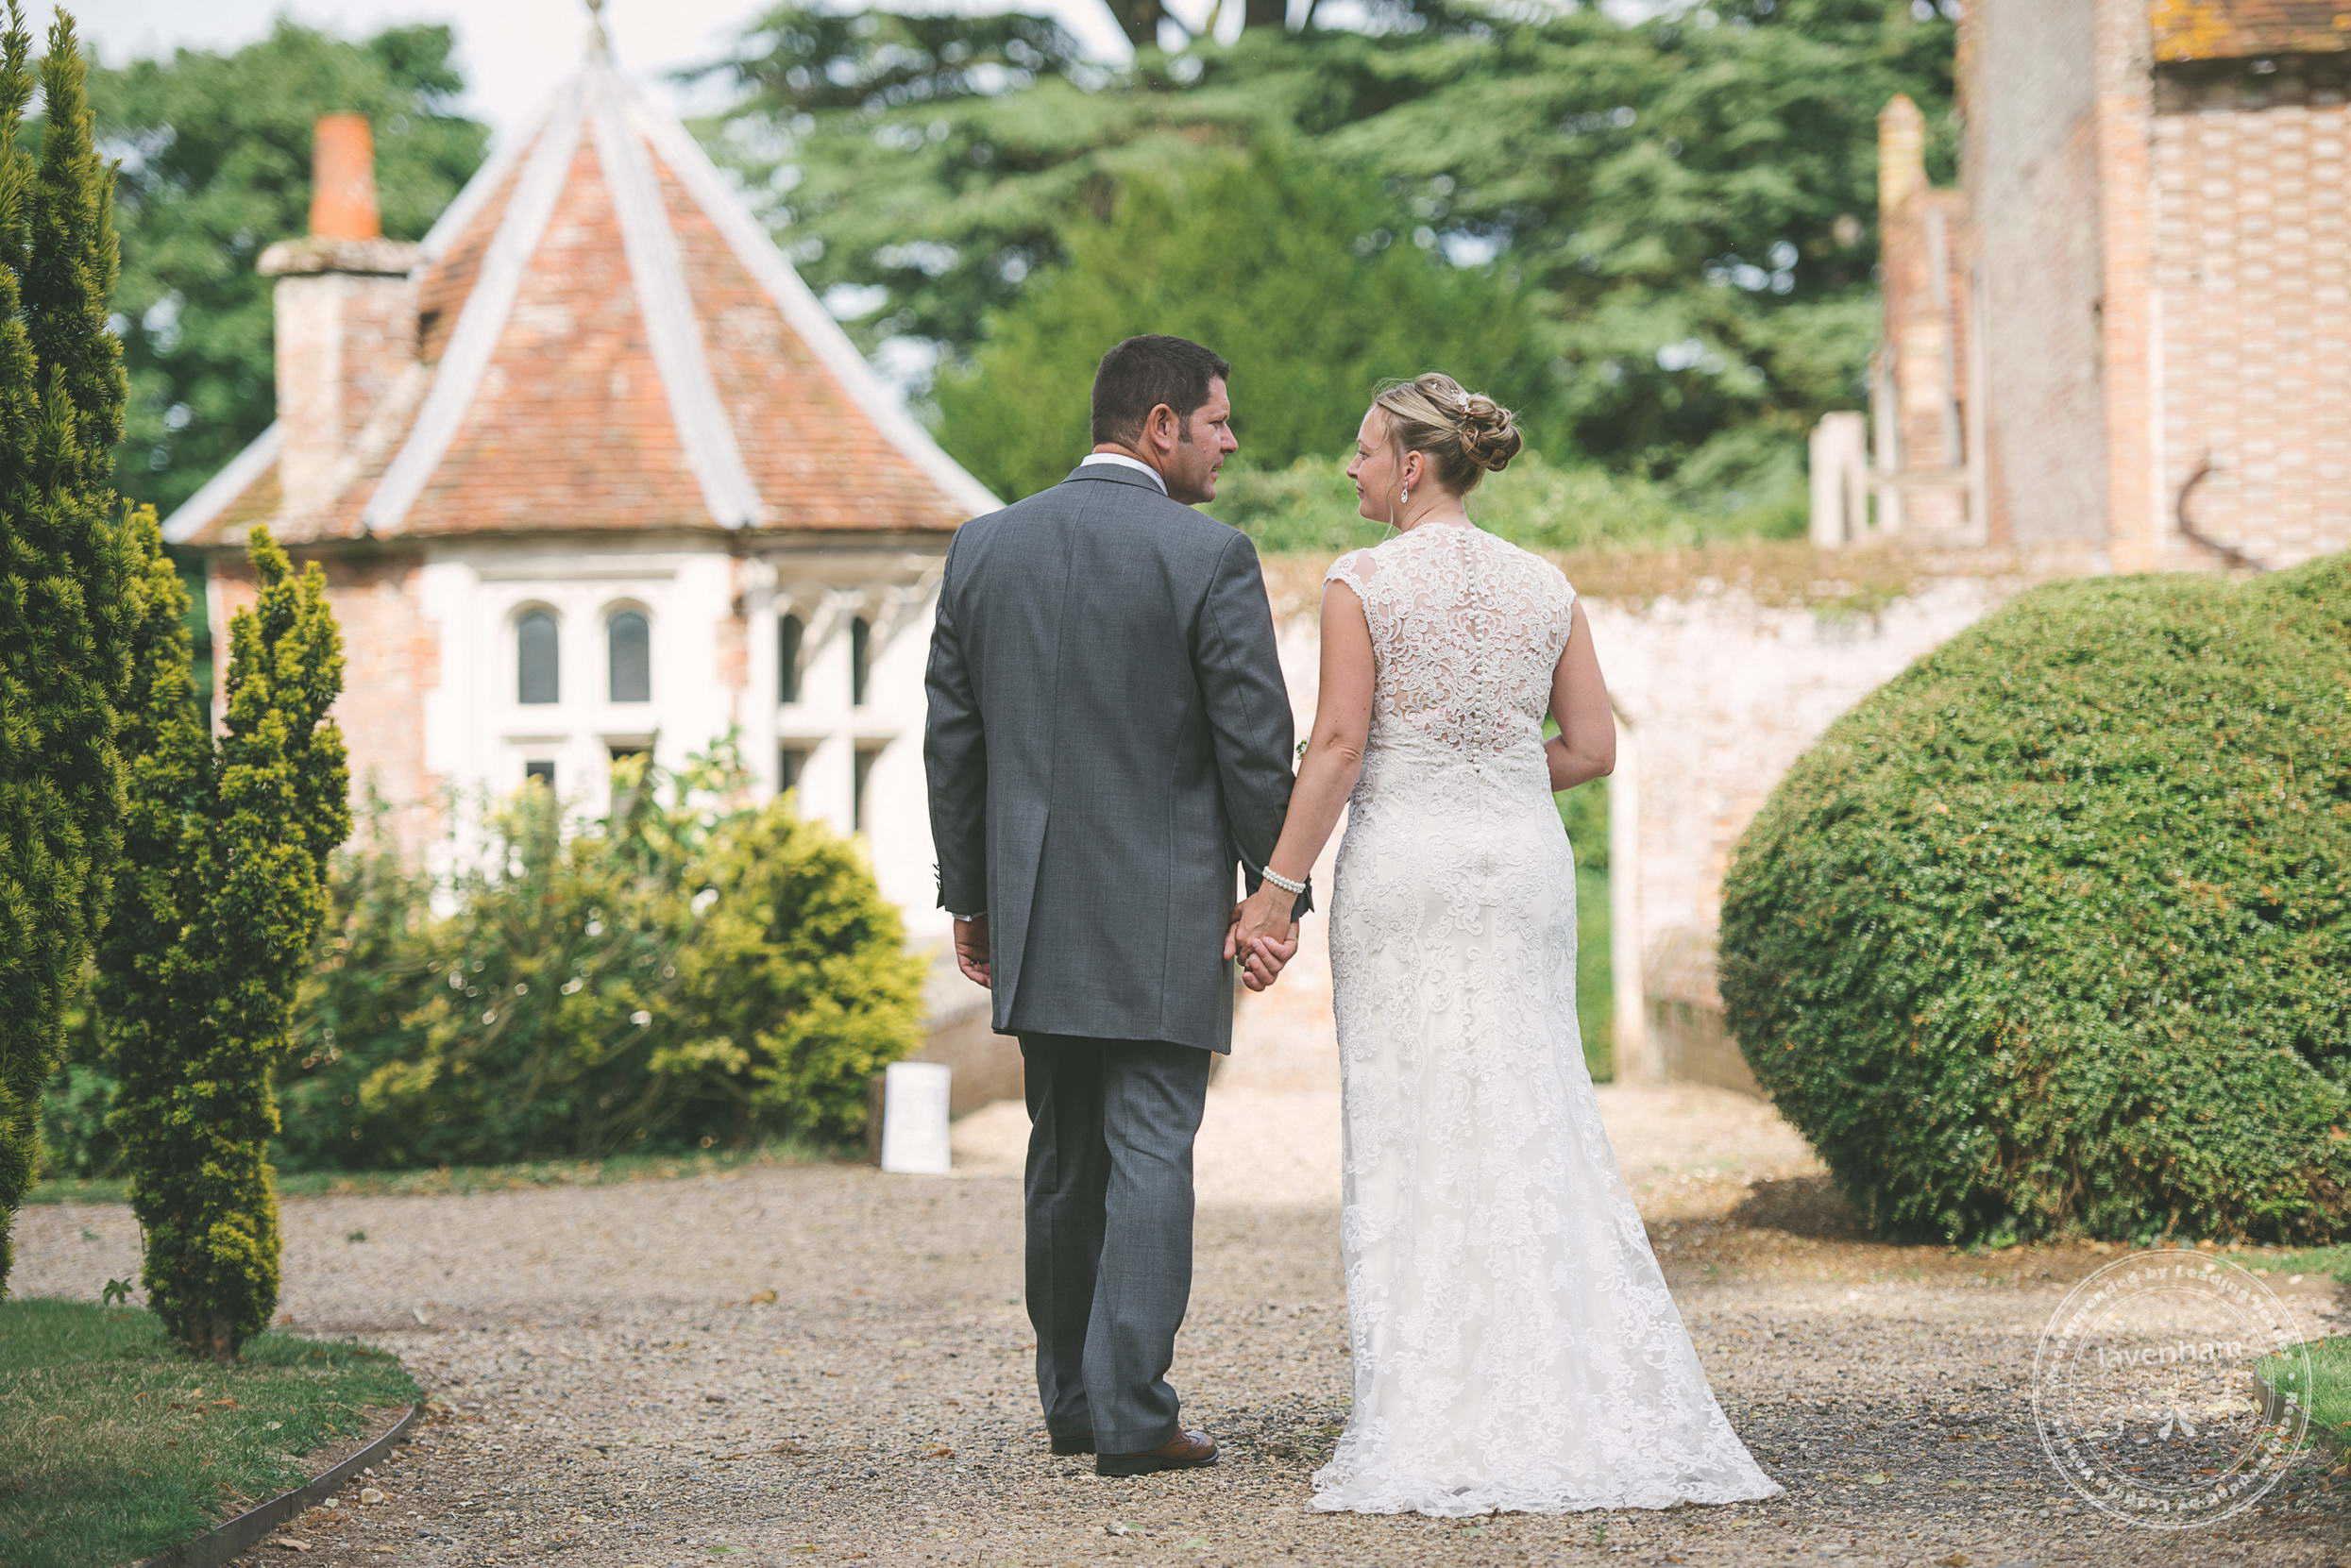 180715-kentwell-hall-wedding-photographer-027